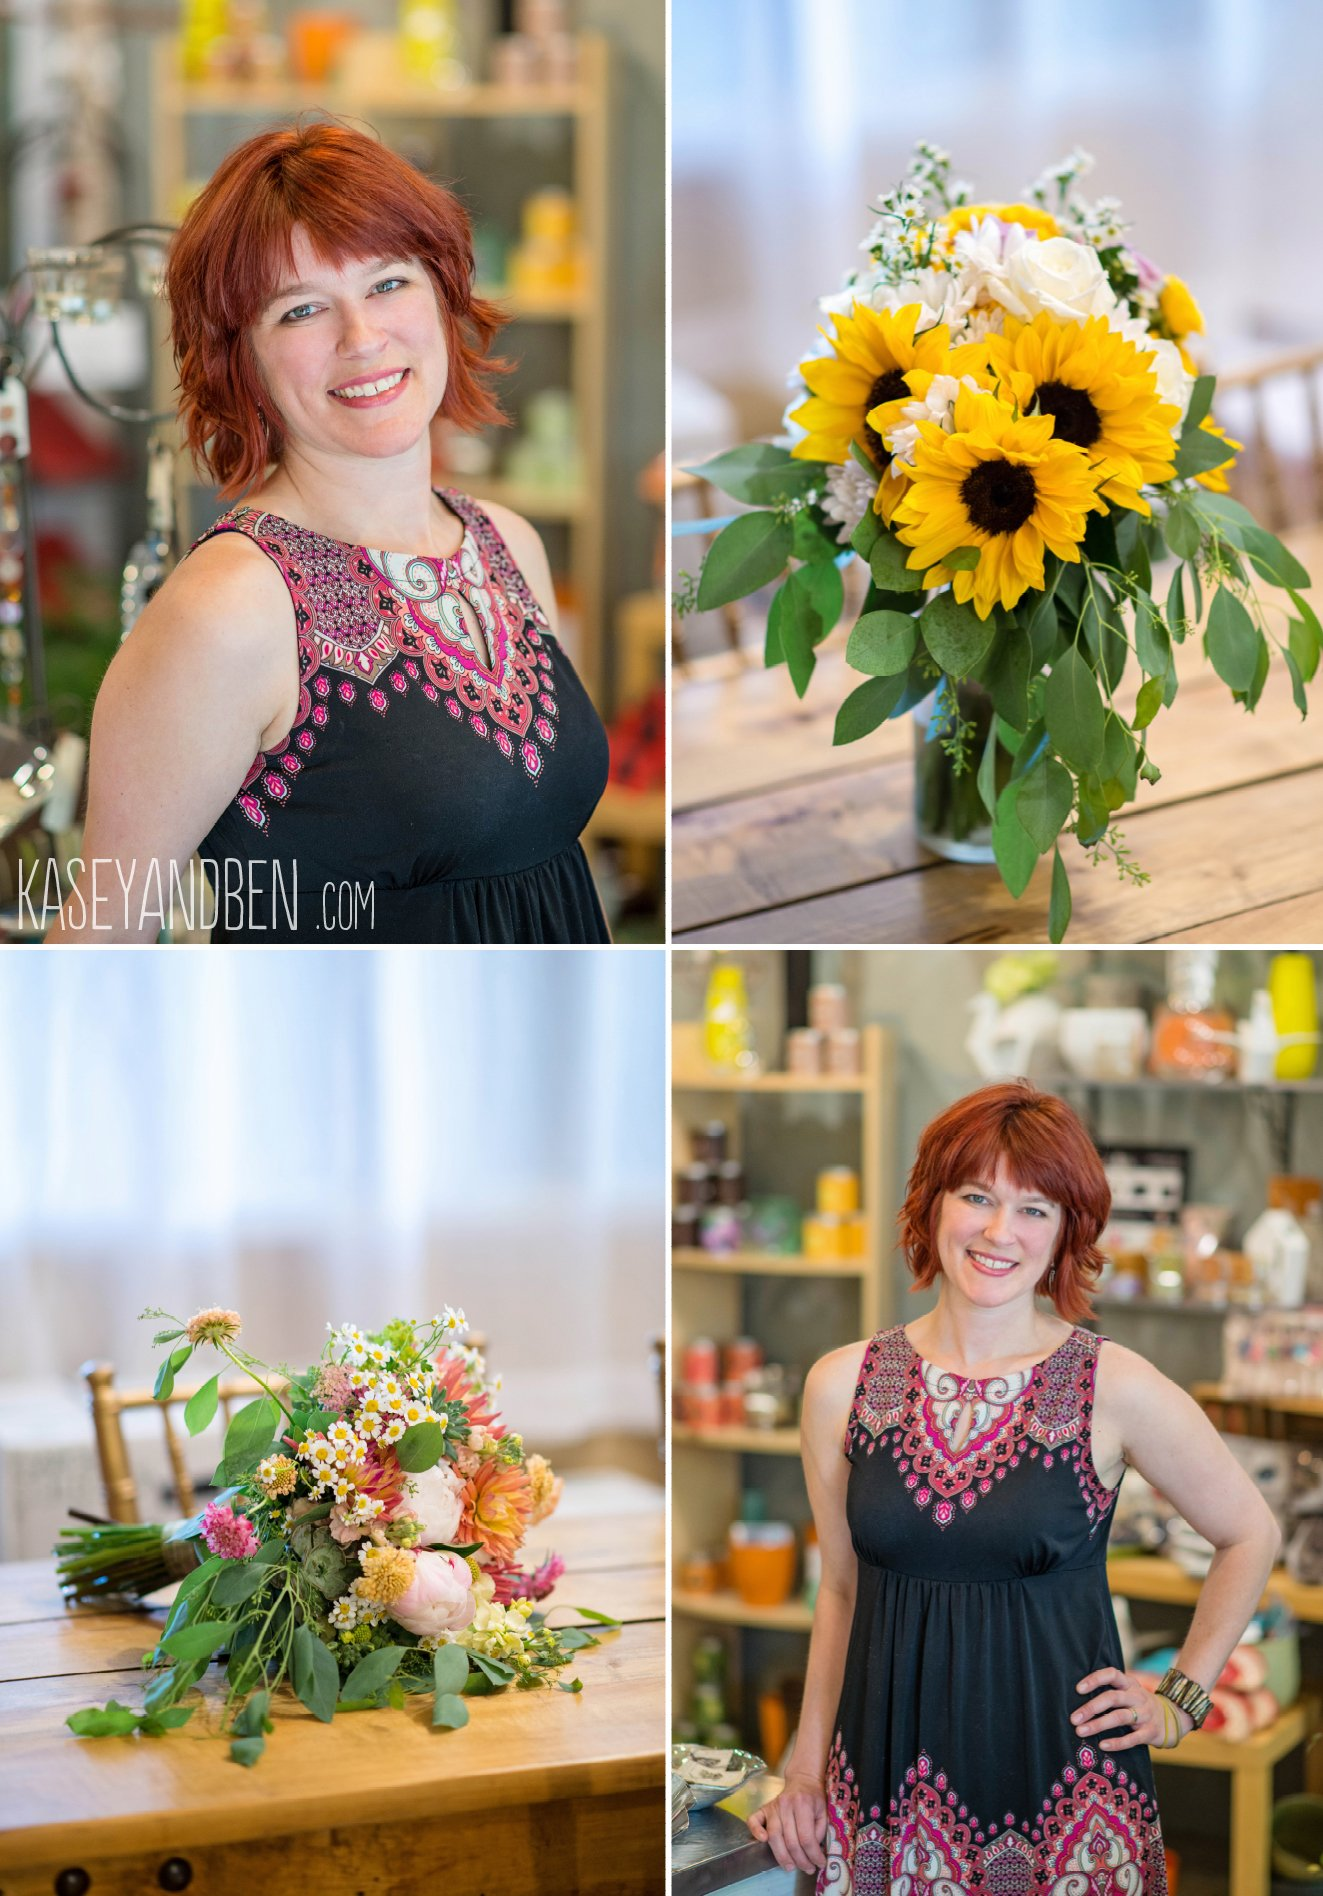 Green-Bay-Florist-Wisconsin-Photography-Petal-Pusher-Business-Branding-Flowers-Wedding-Advice